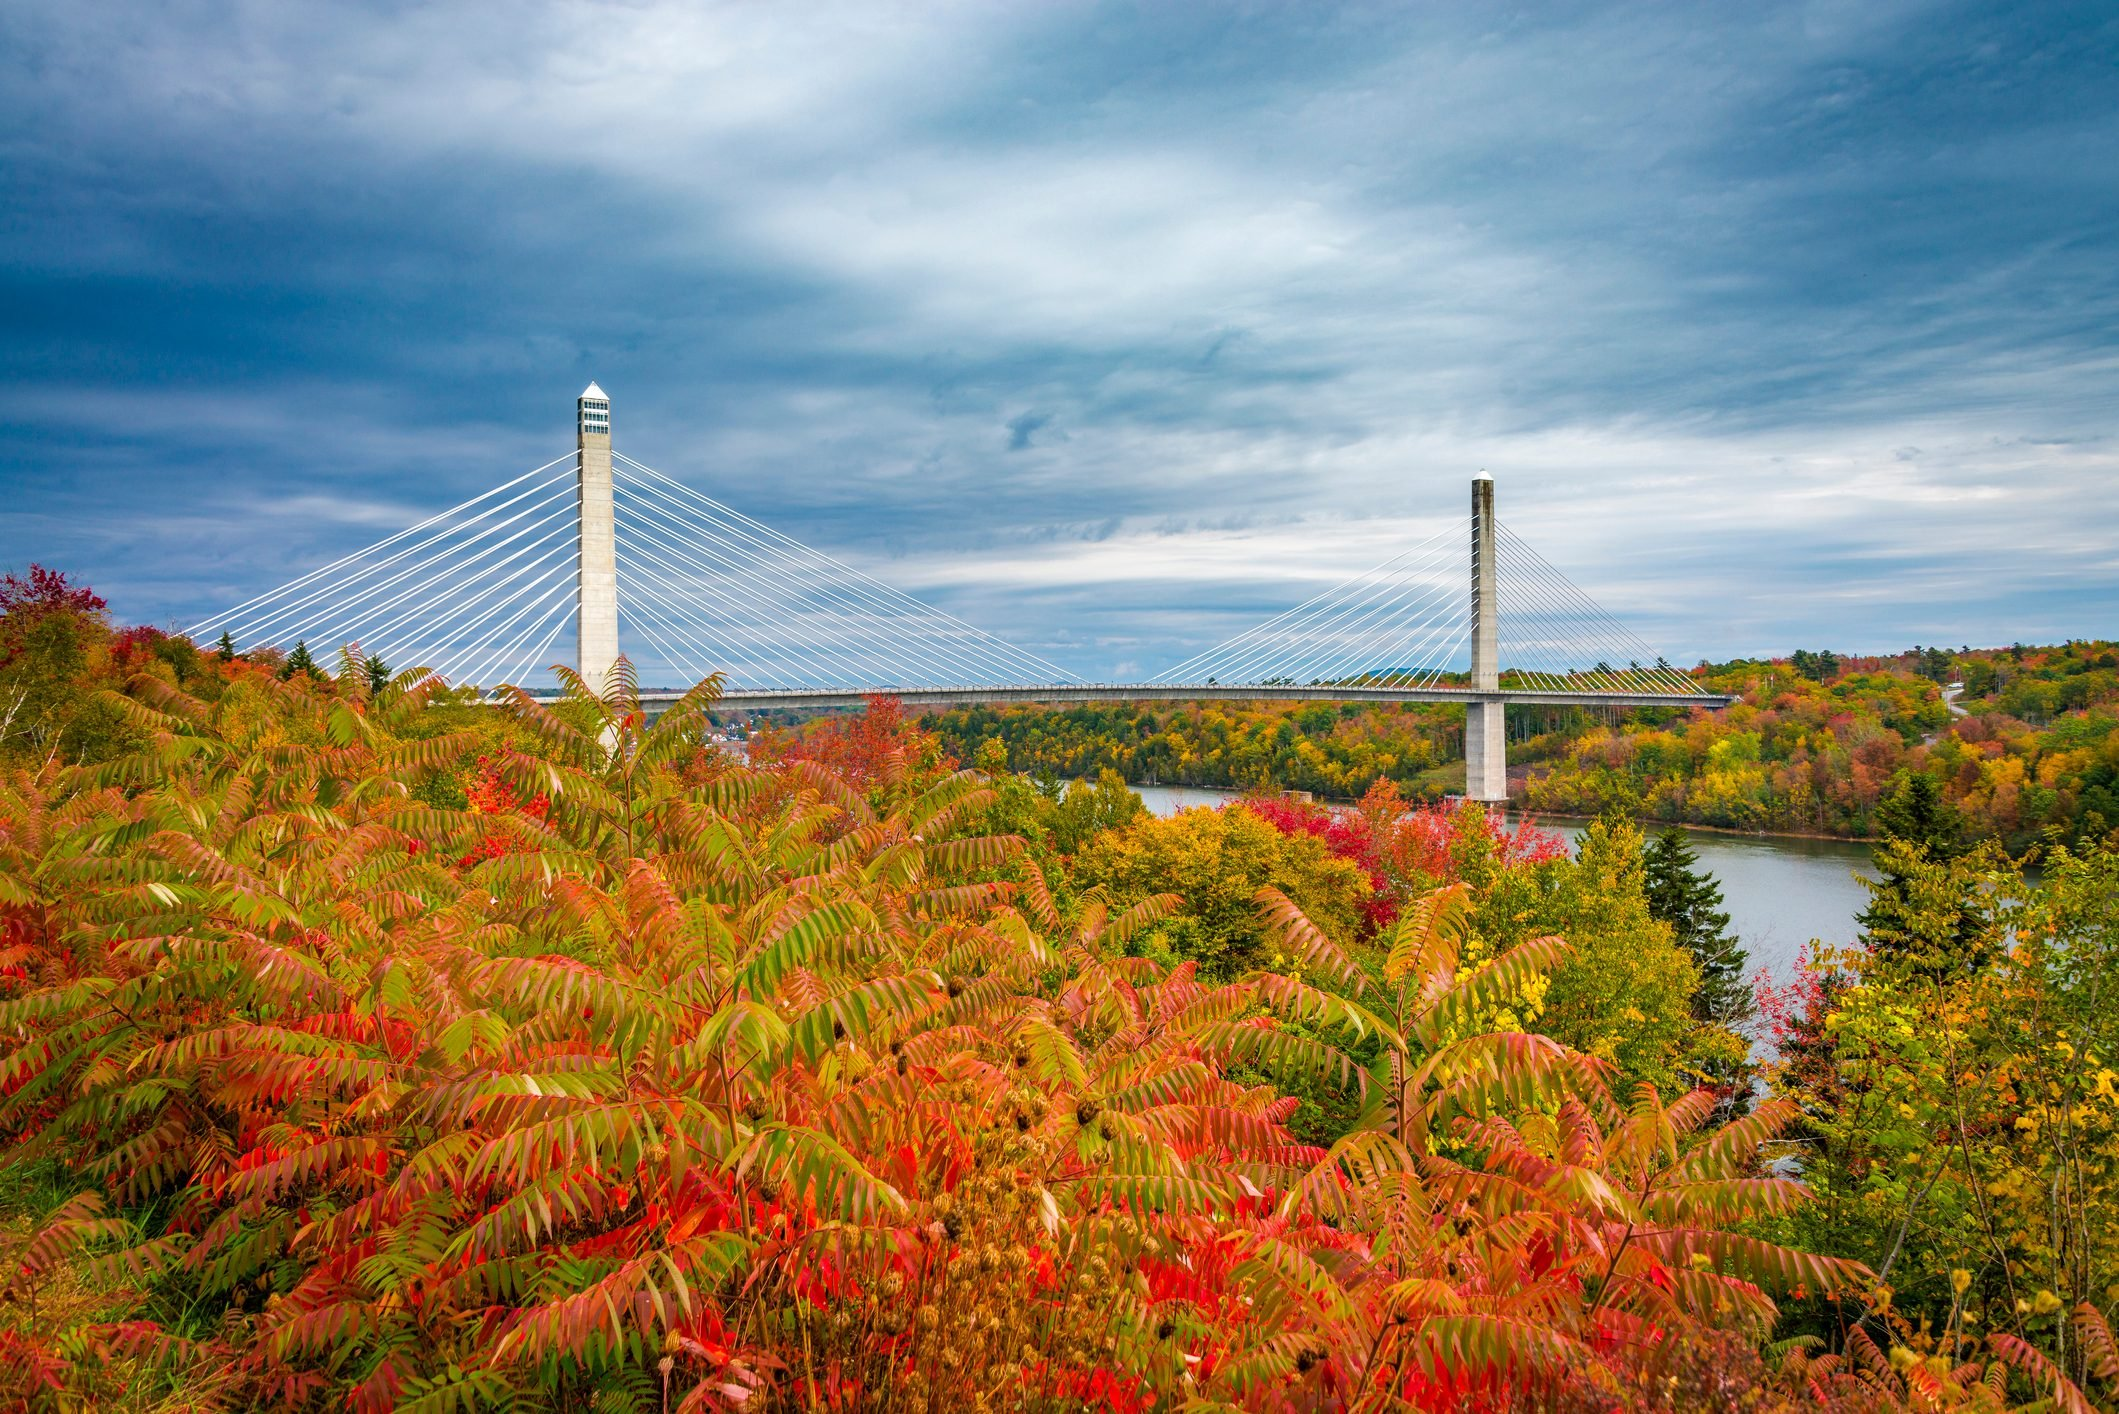 The Penobscot Narrows Bridge in autumn